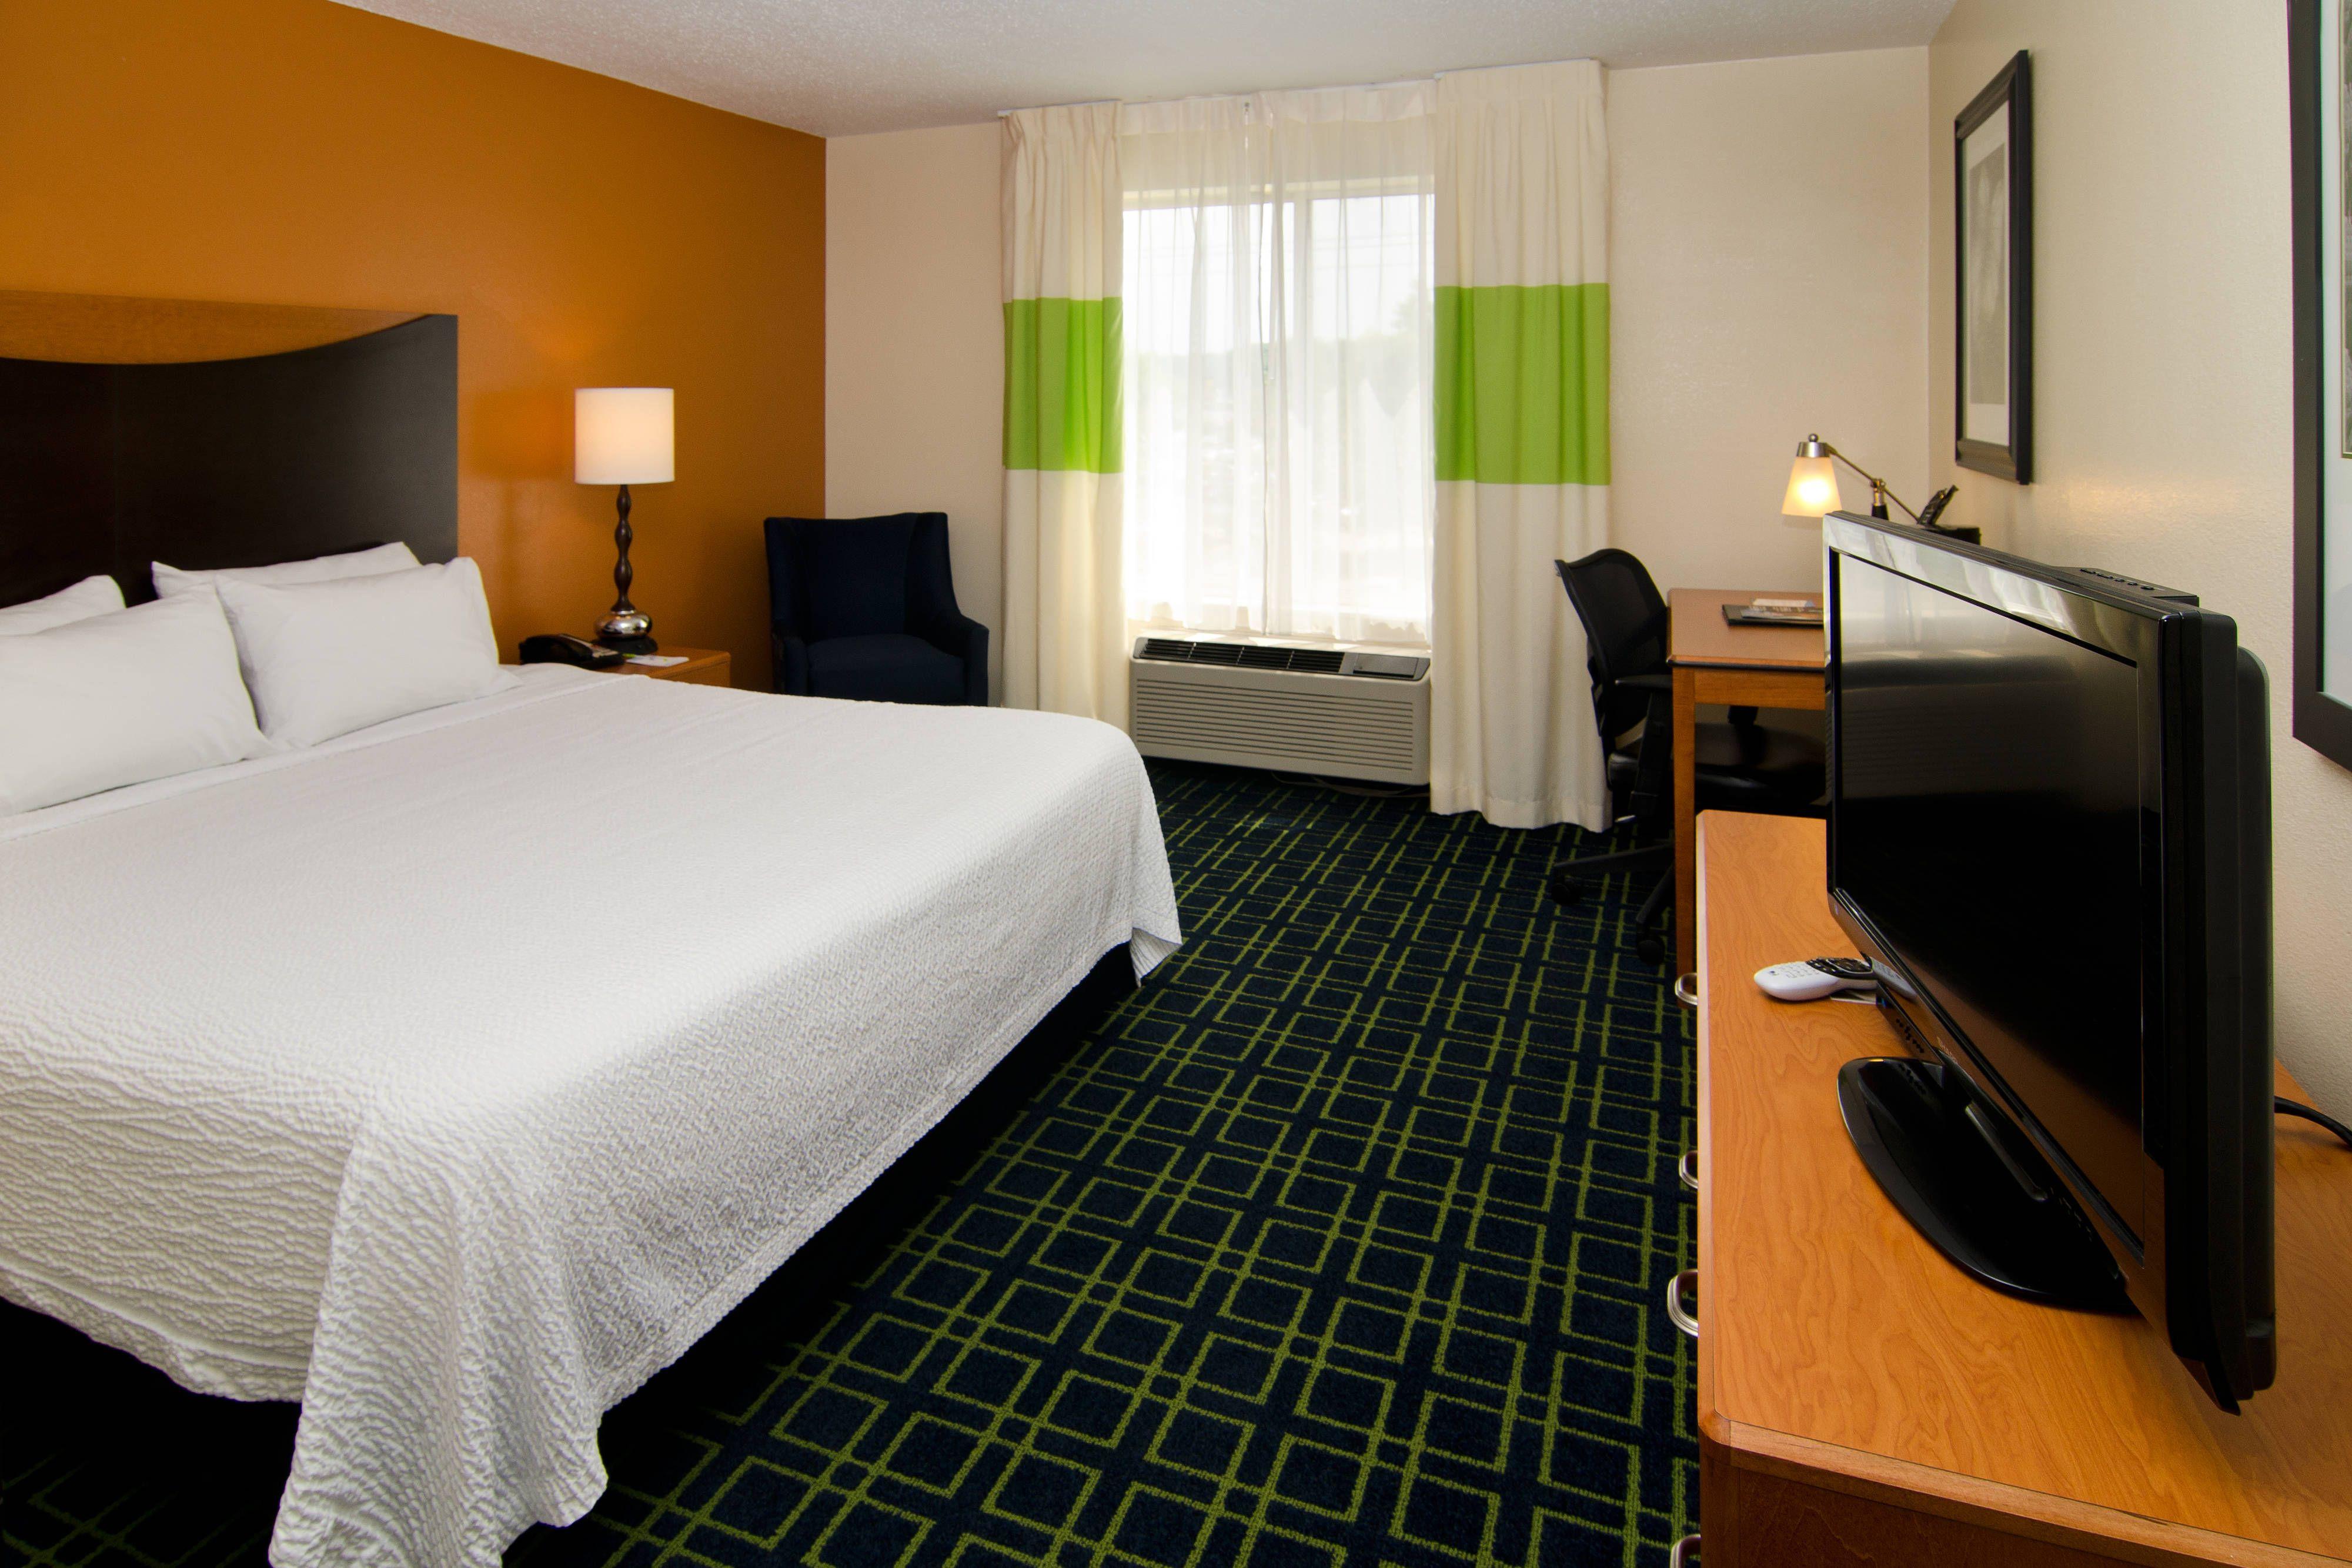 Fairfield Inn St. Louis Fenton King Guest Room Suite,